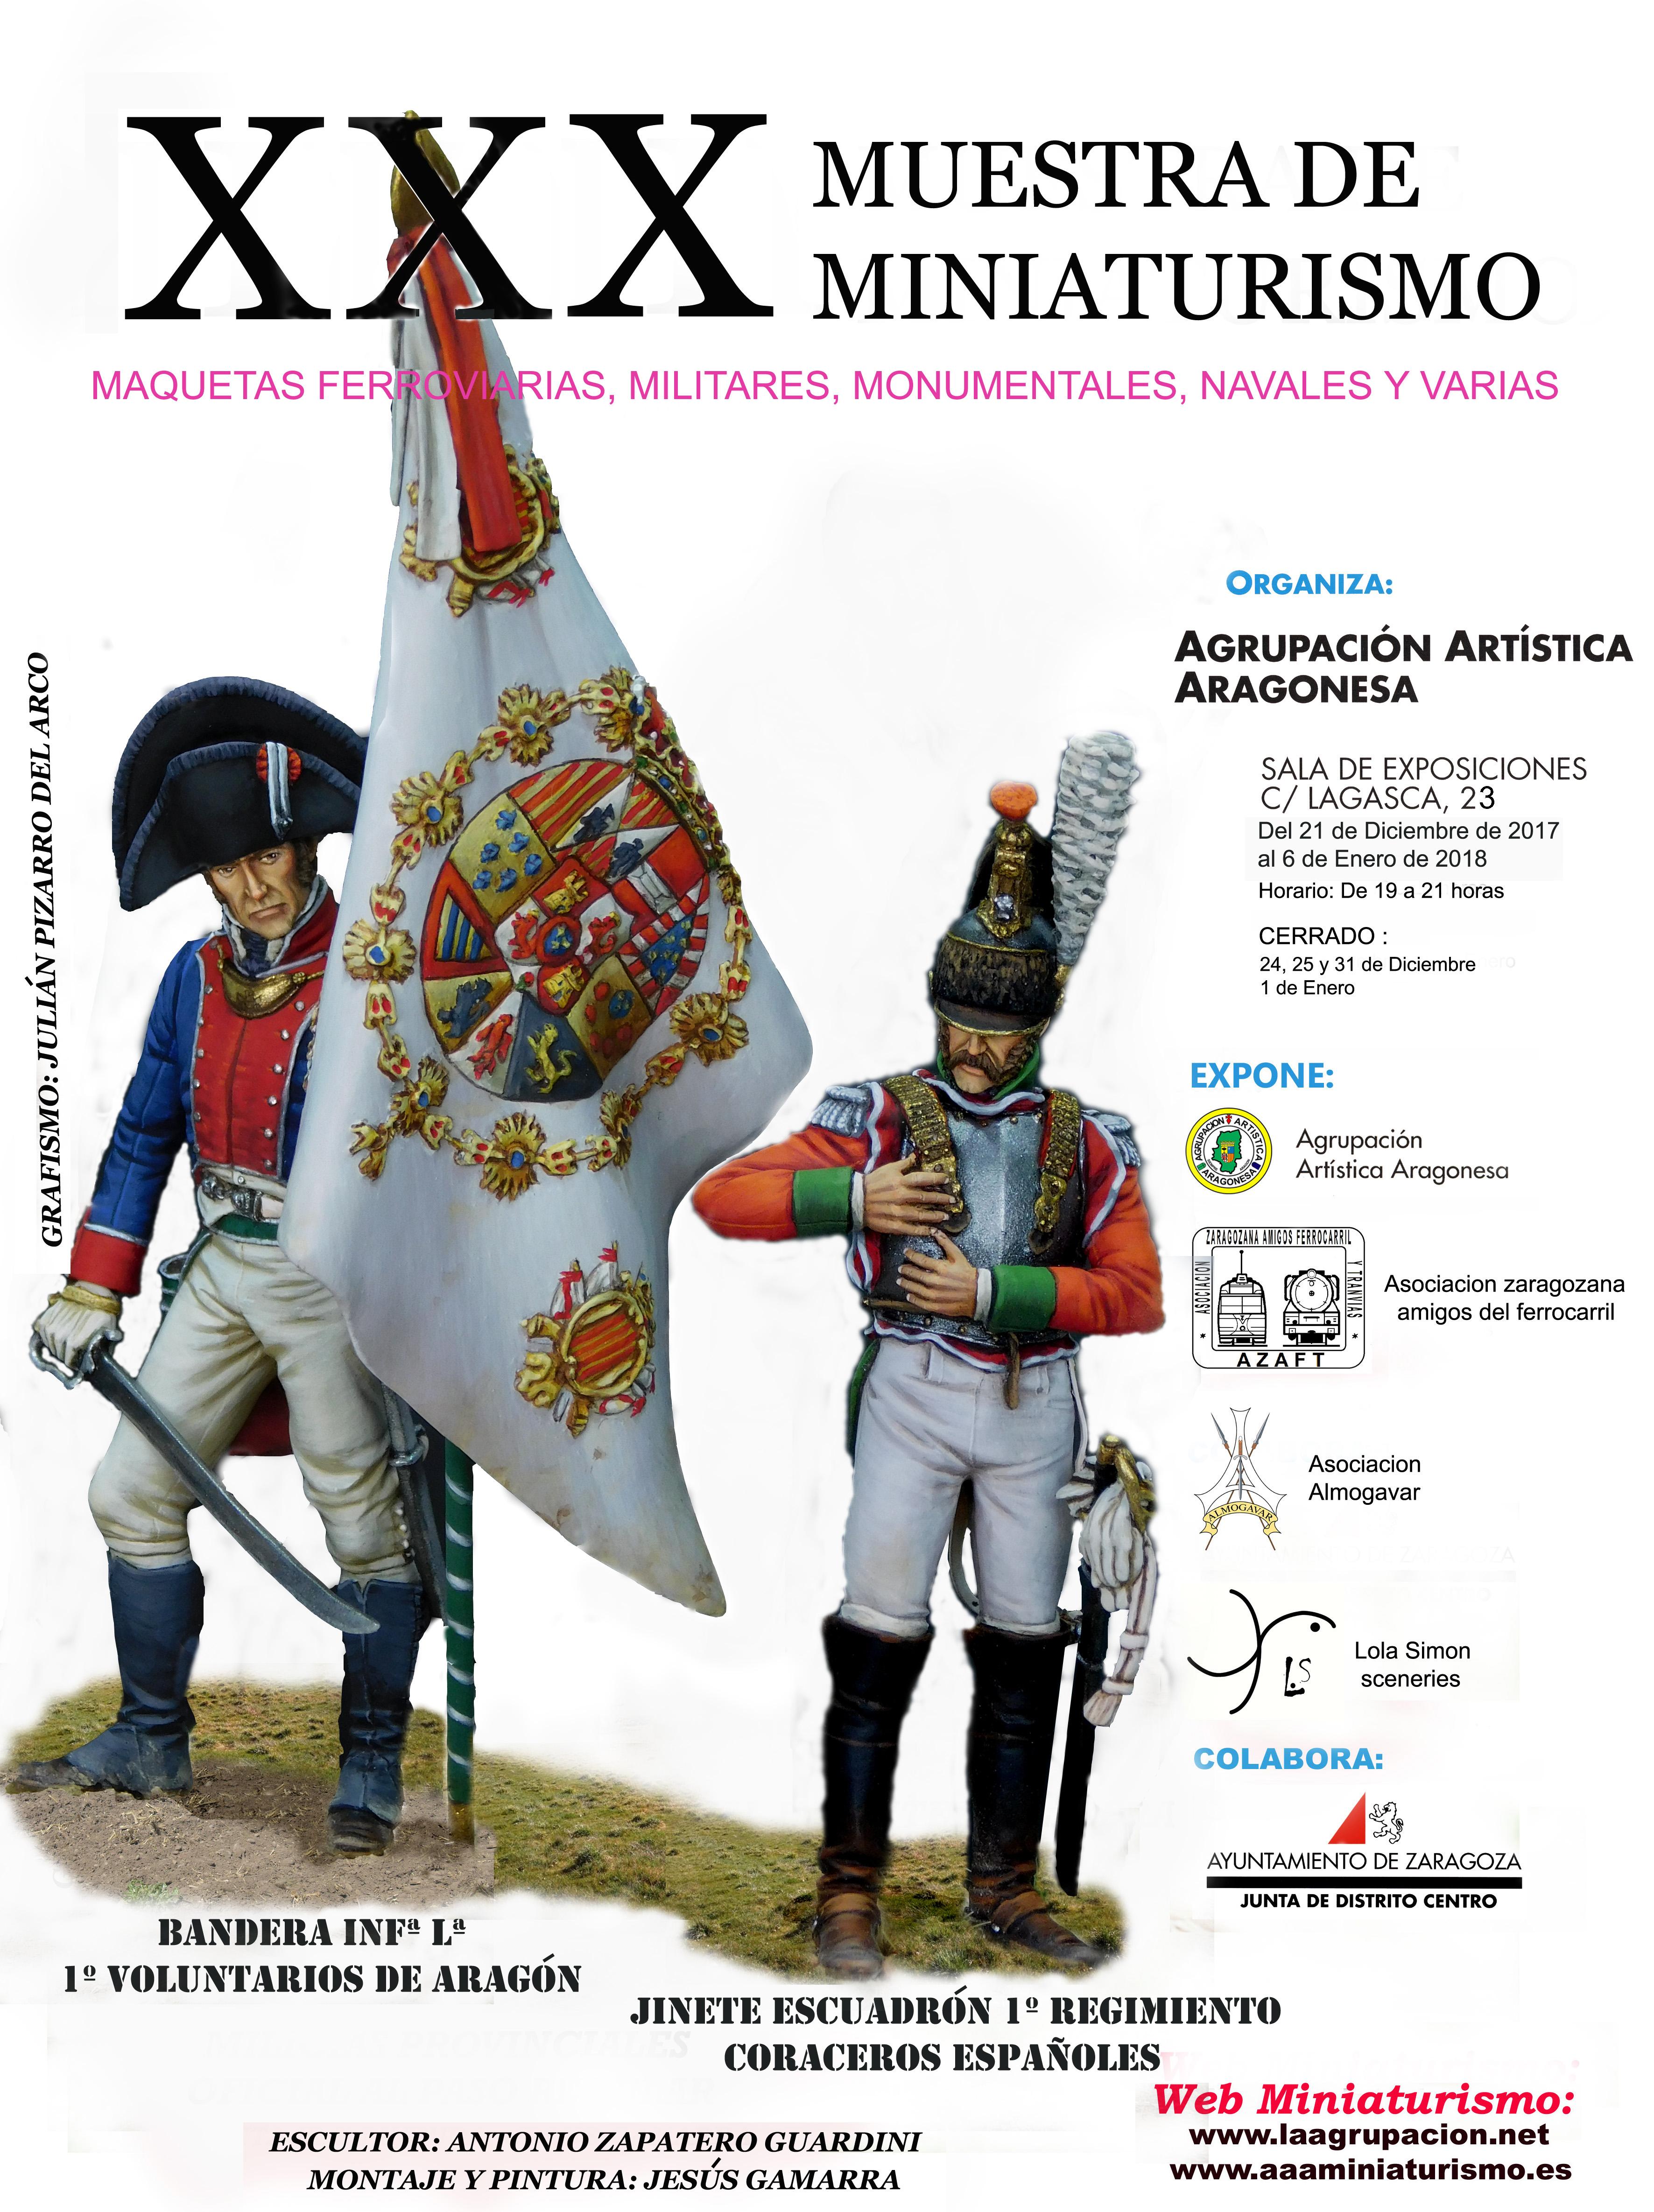 XXX Muestra de Miniaturismo